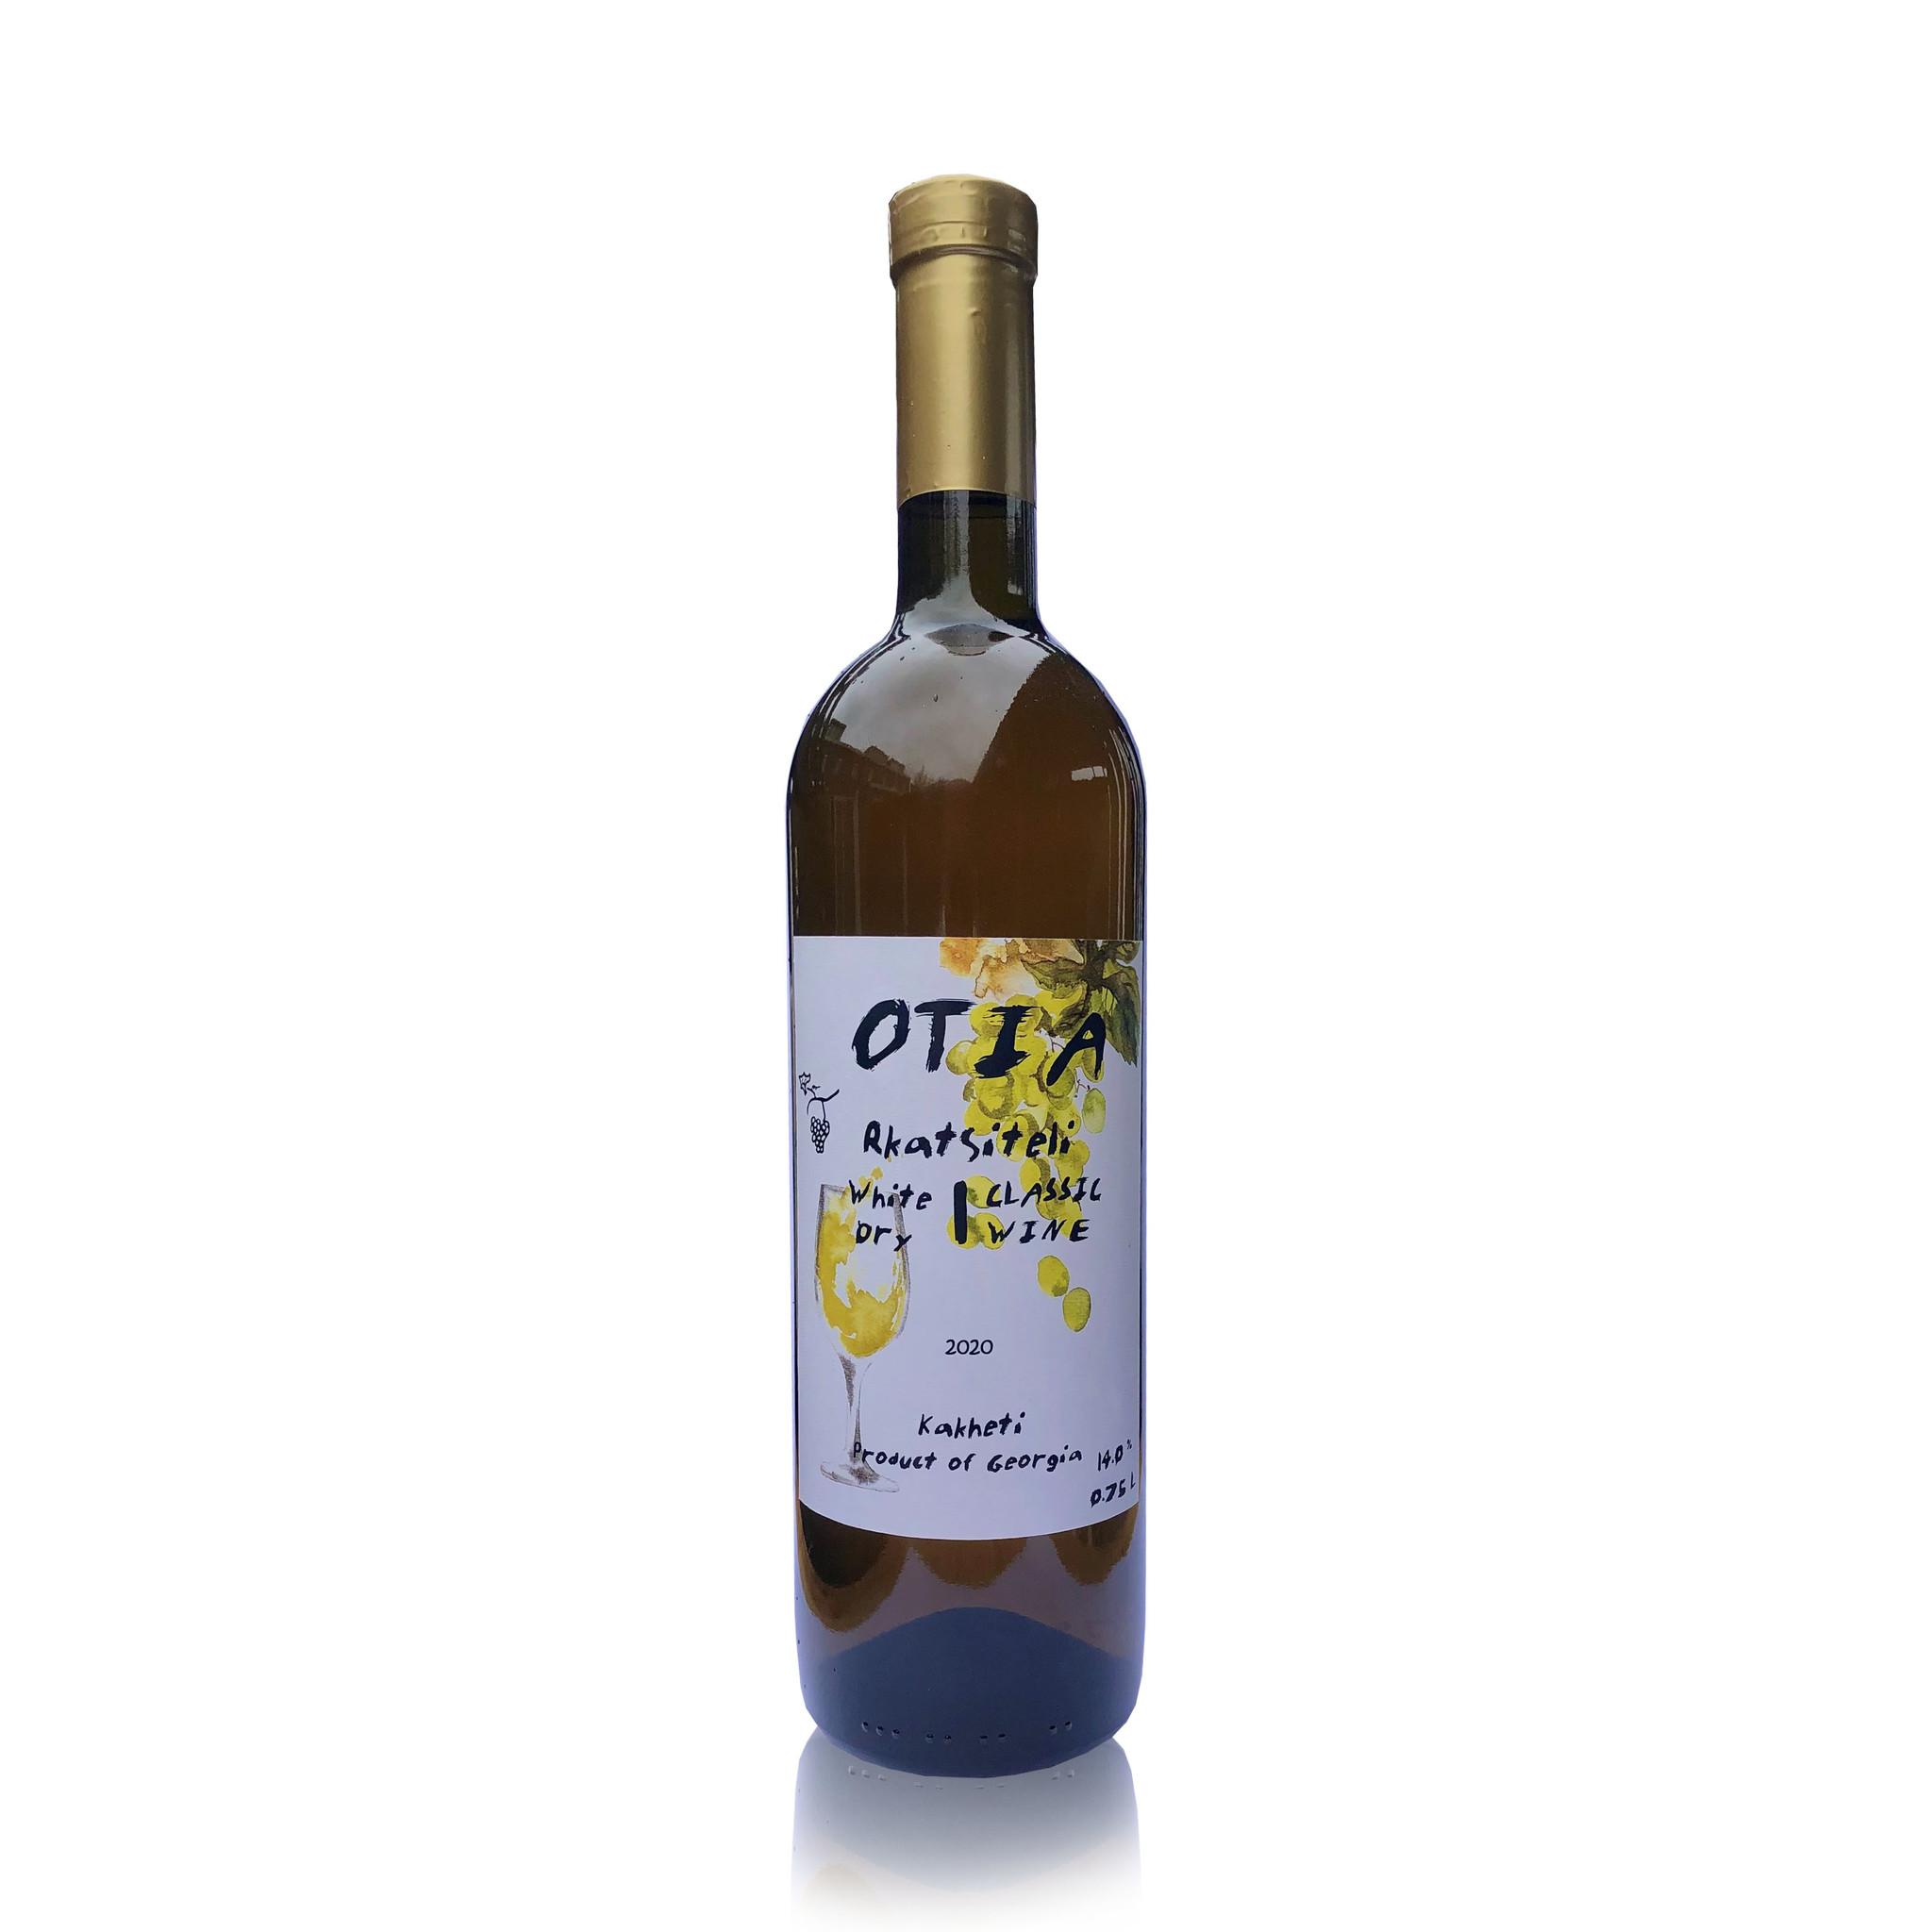 OTIA  OTIA Rkatsiteli, Classic white dry wine 2020